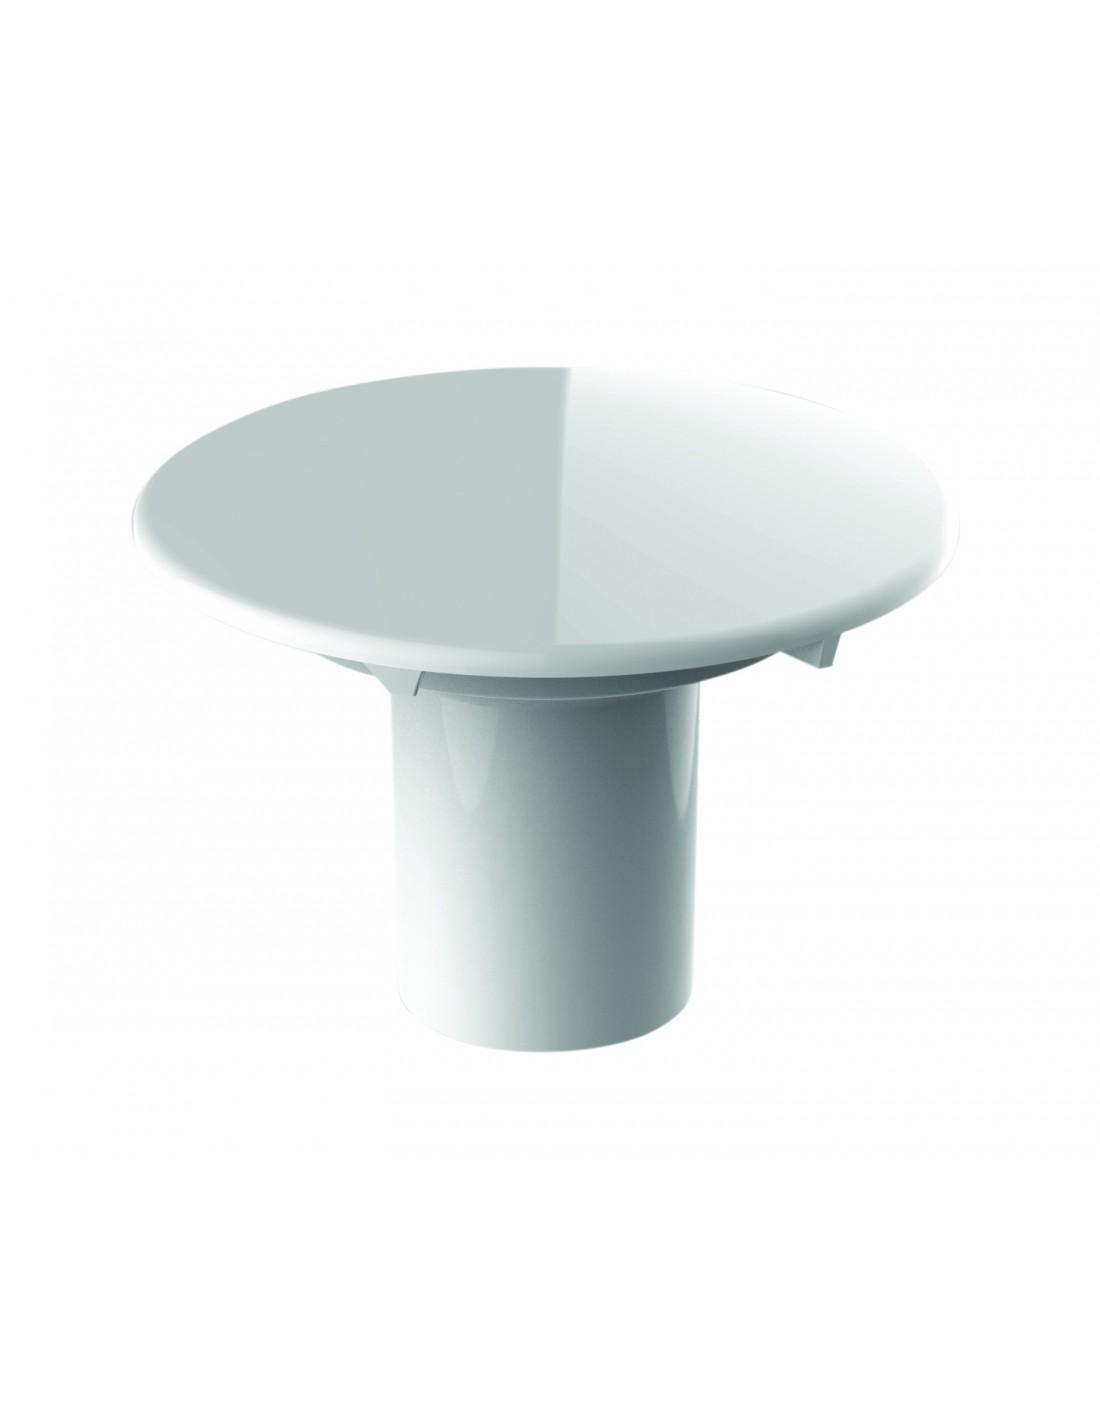 capot de bonde metal blanc avec tube garde d eau valentin